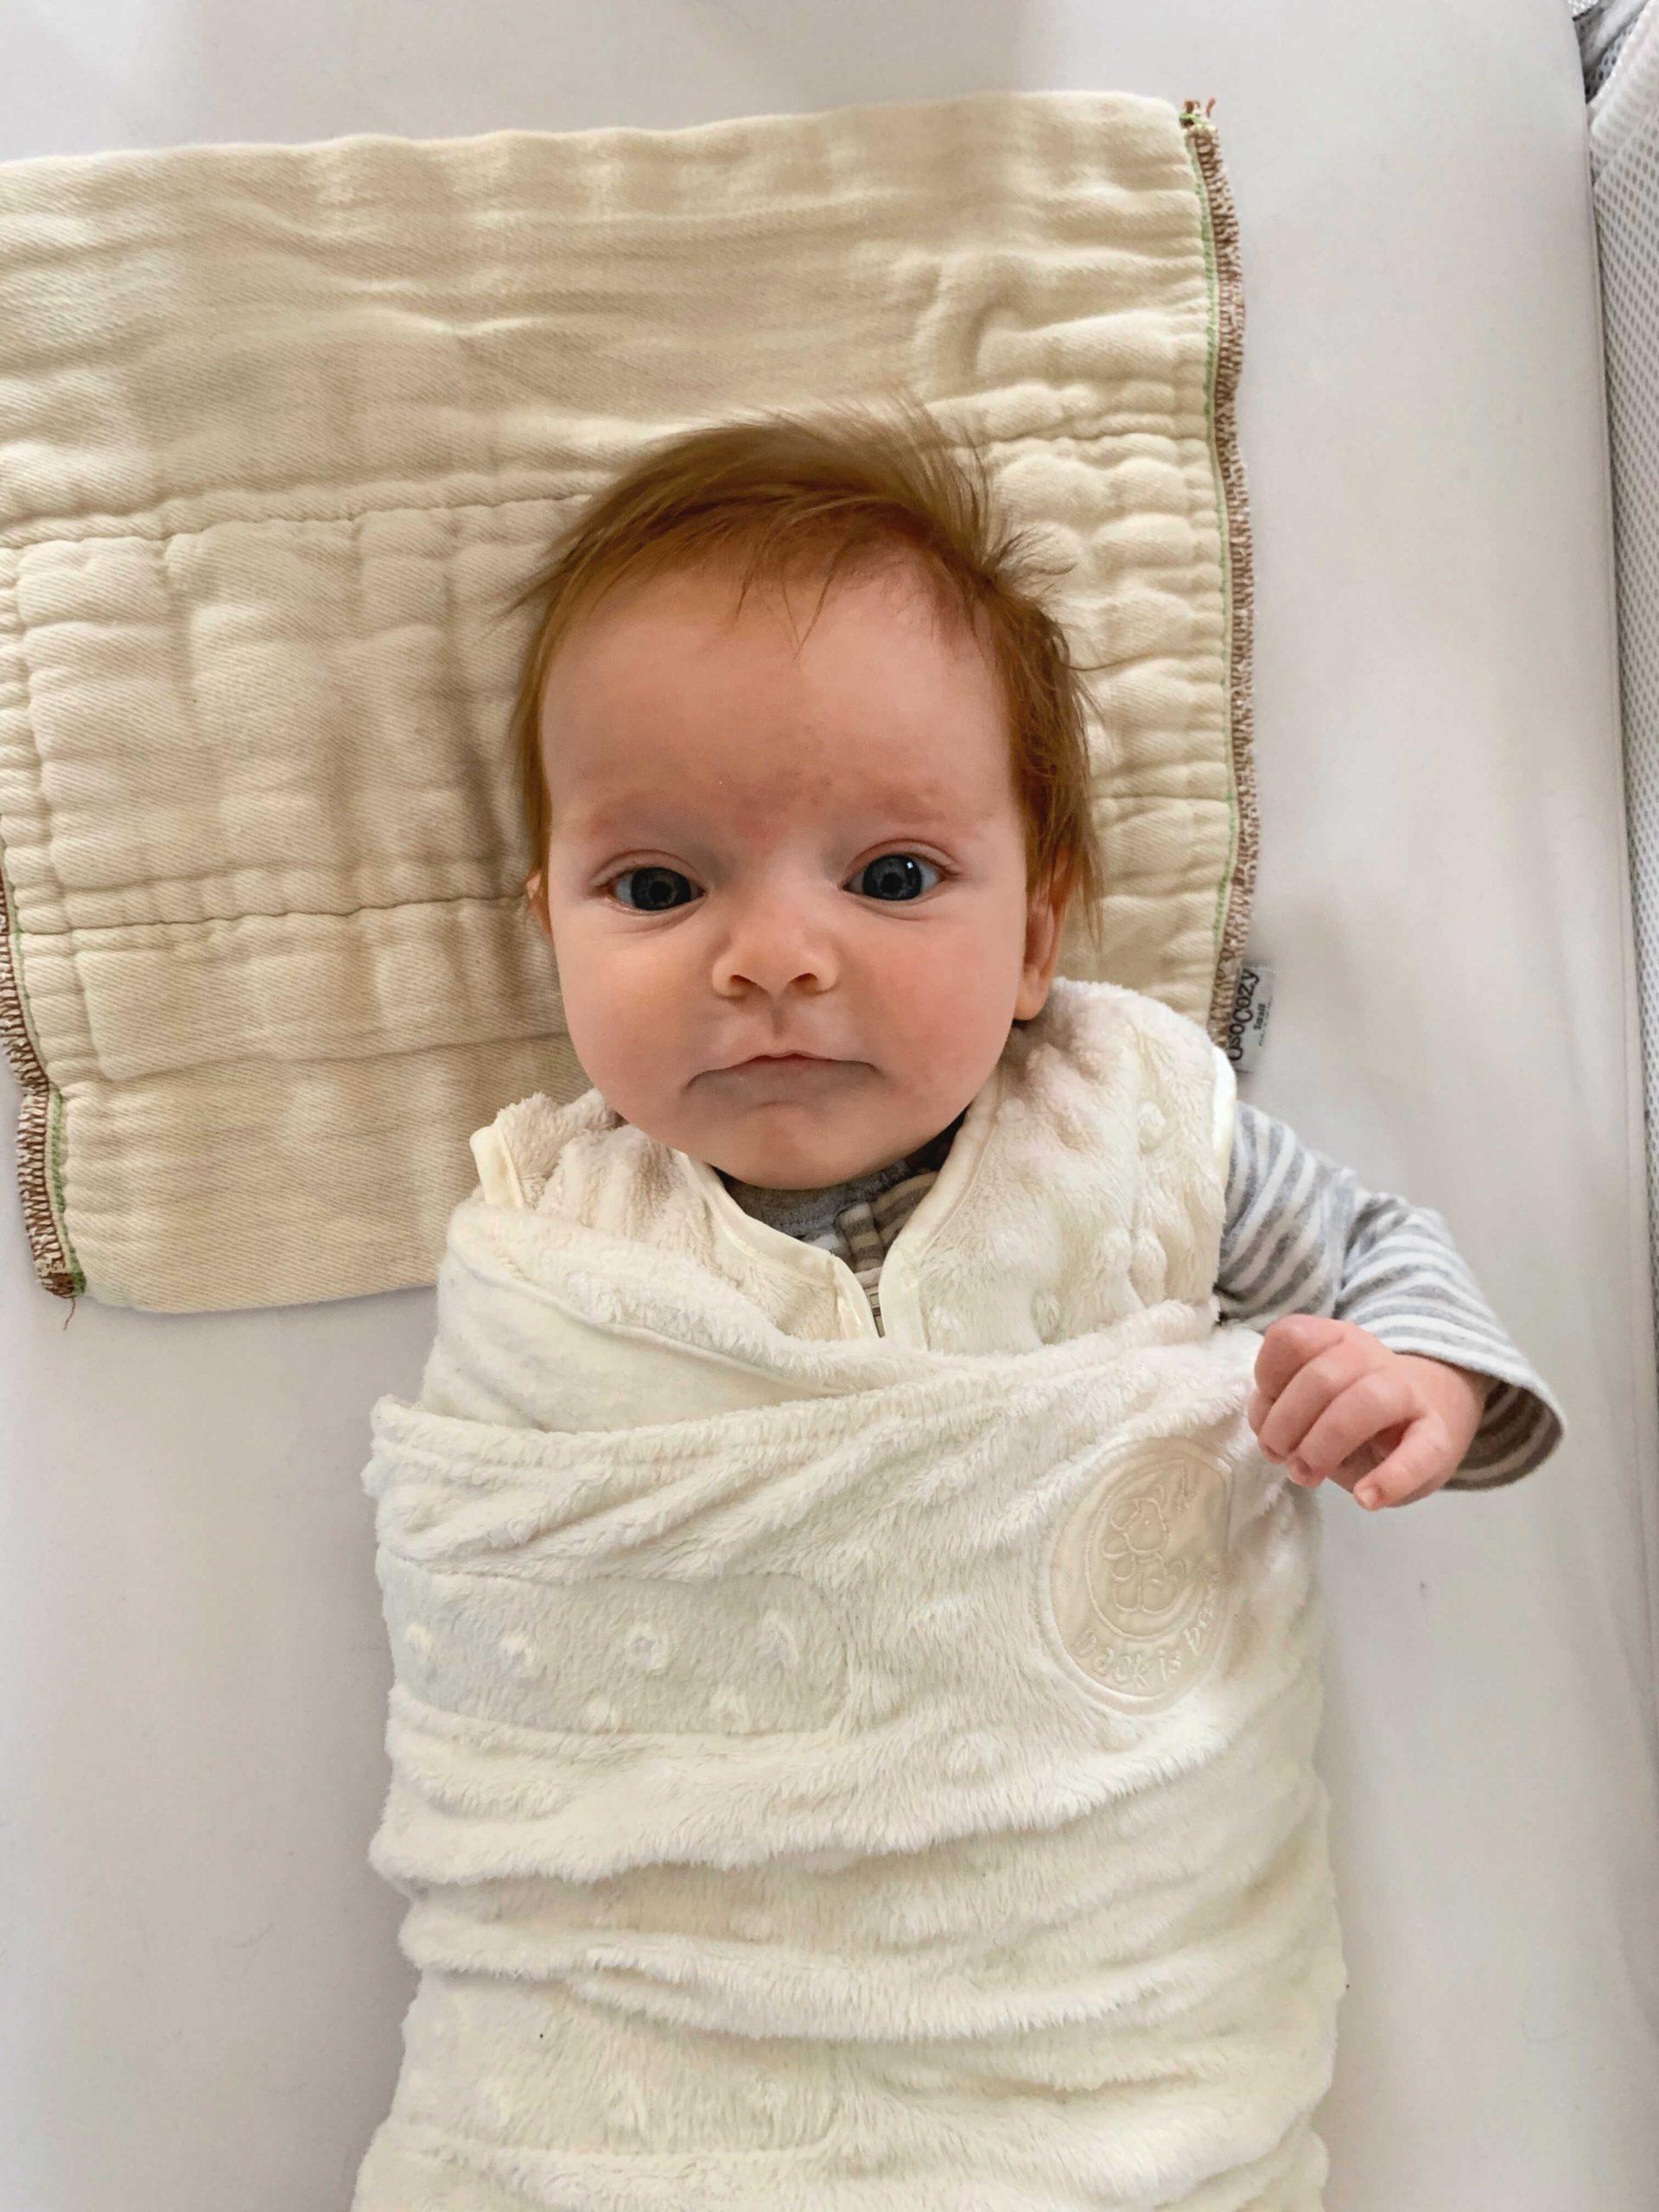 Newborn Essentials - Halo Sleepsack Swaddle